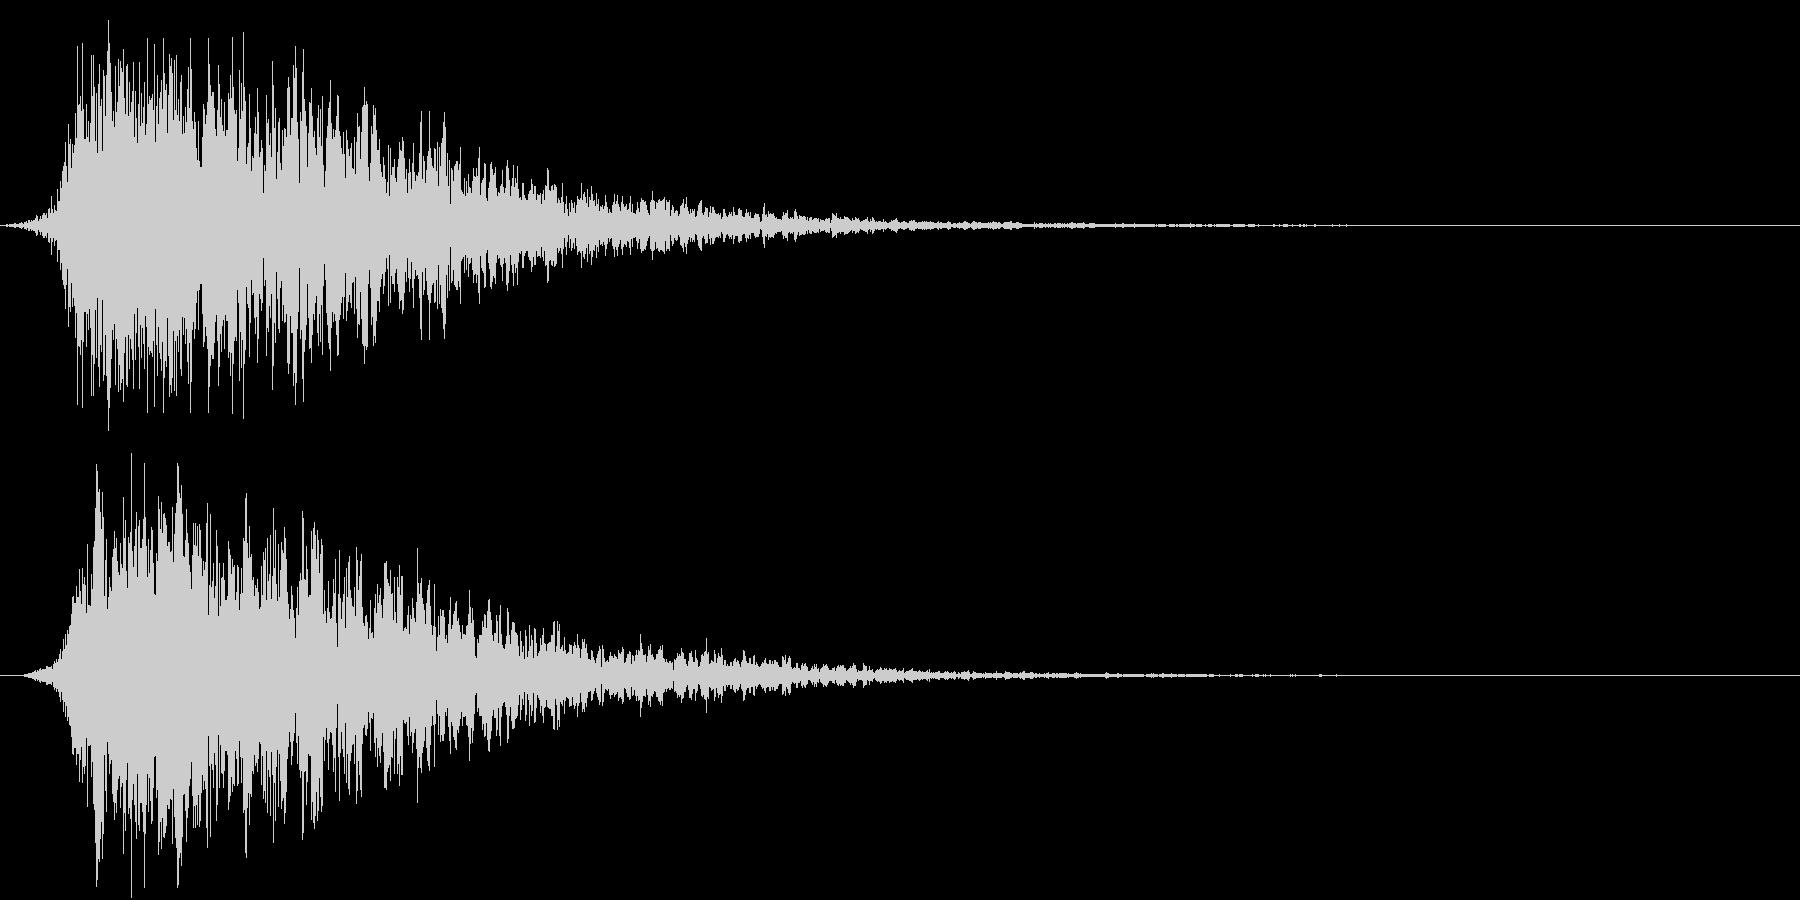 SFX 地獄の呻き声を連想させるPADの未再生の波形